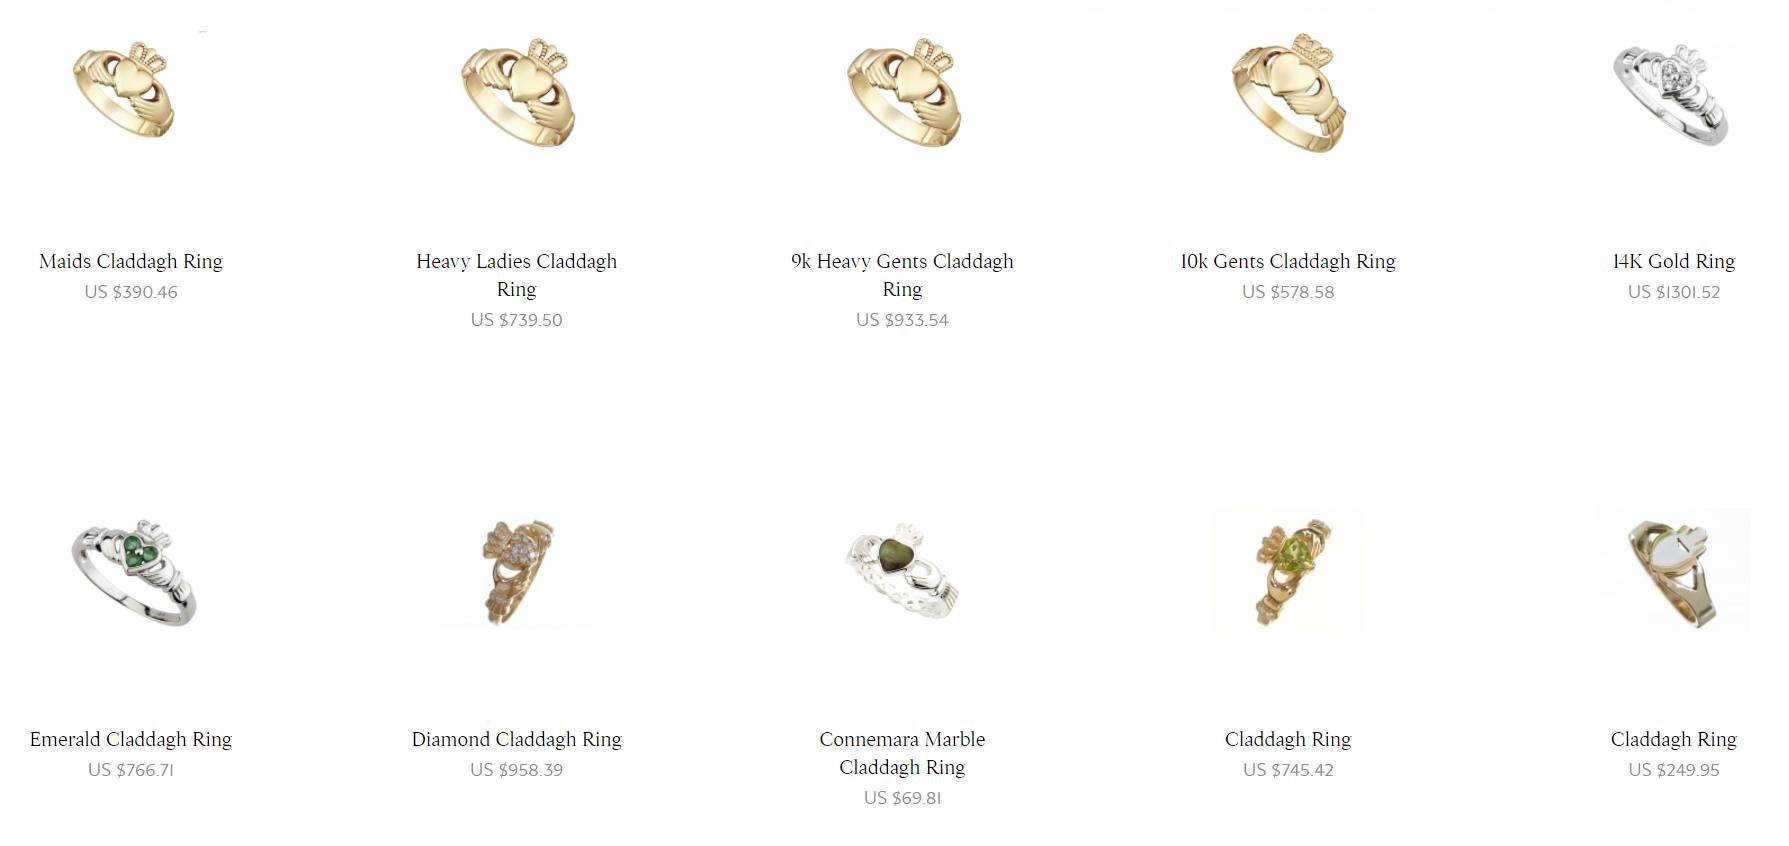 Claddagh Rings from Irish Jewel